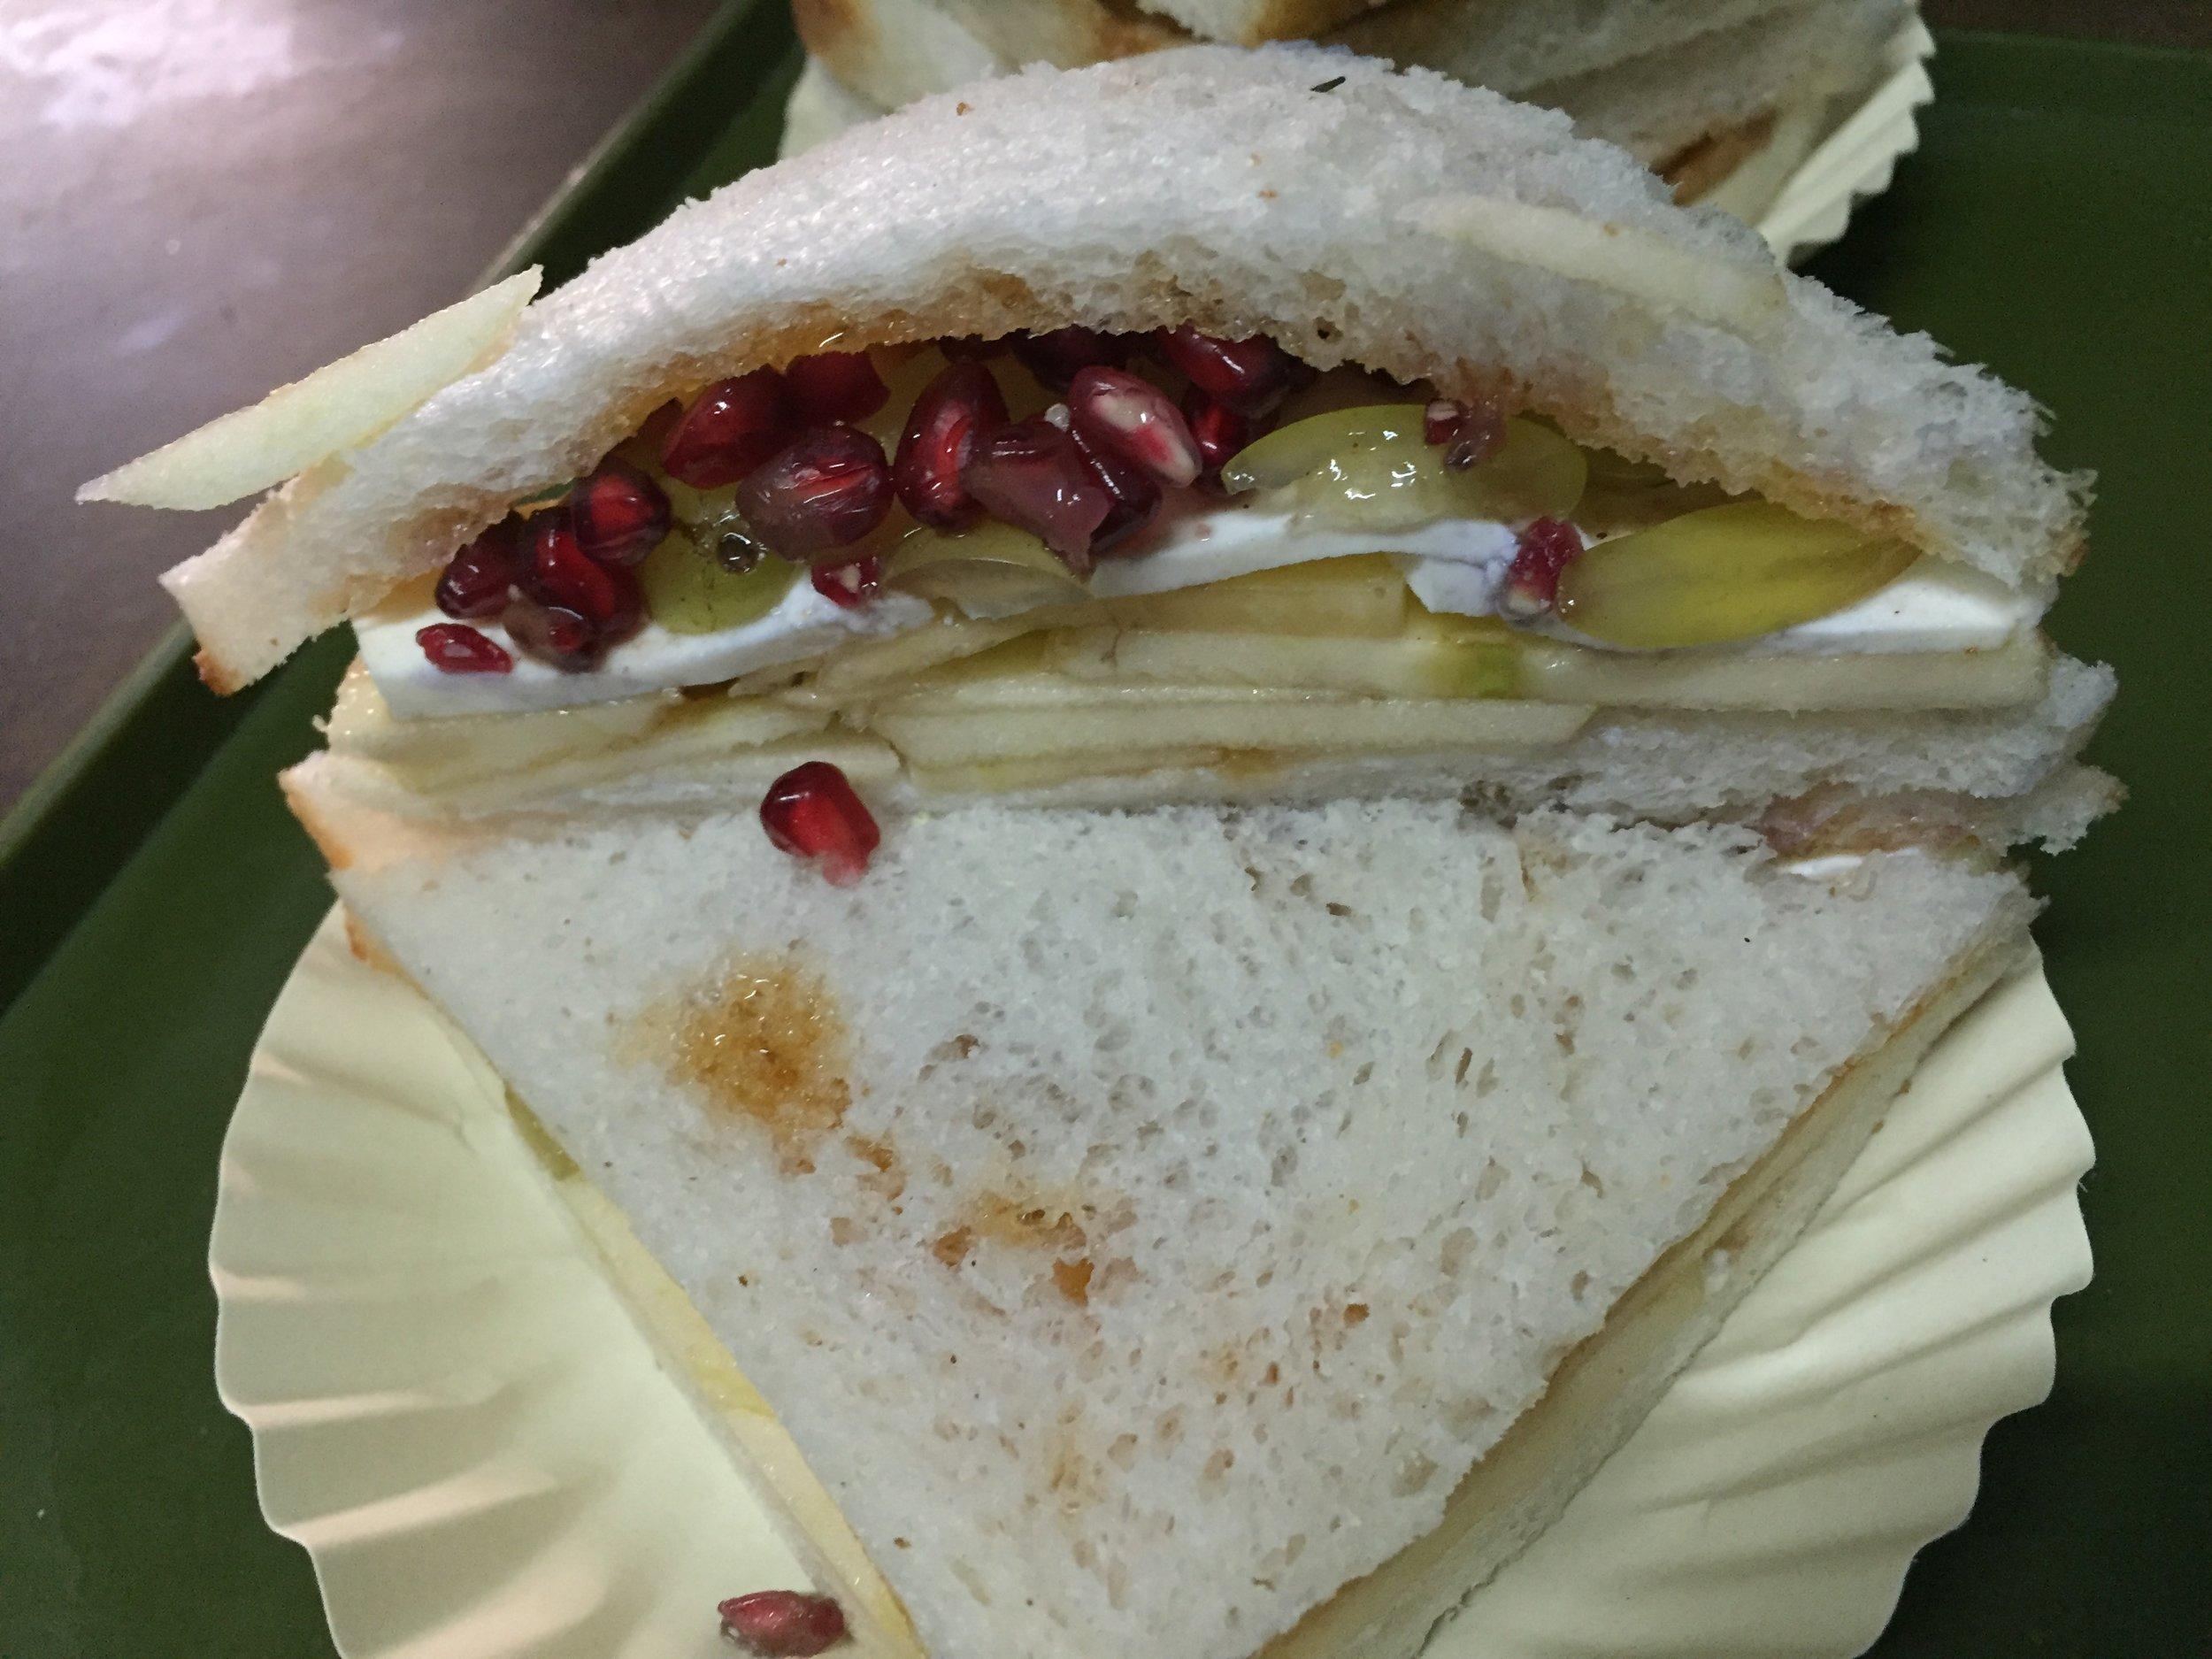 Fresh fruit sandwich in Delhi's Chandni Chowk market